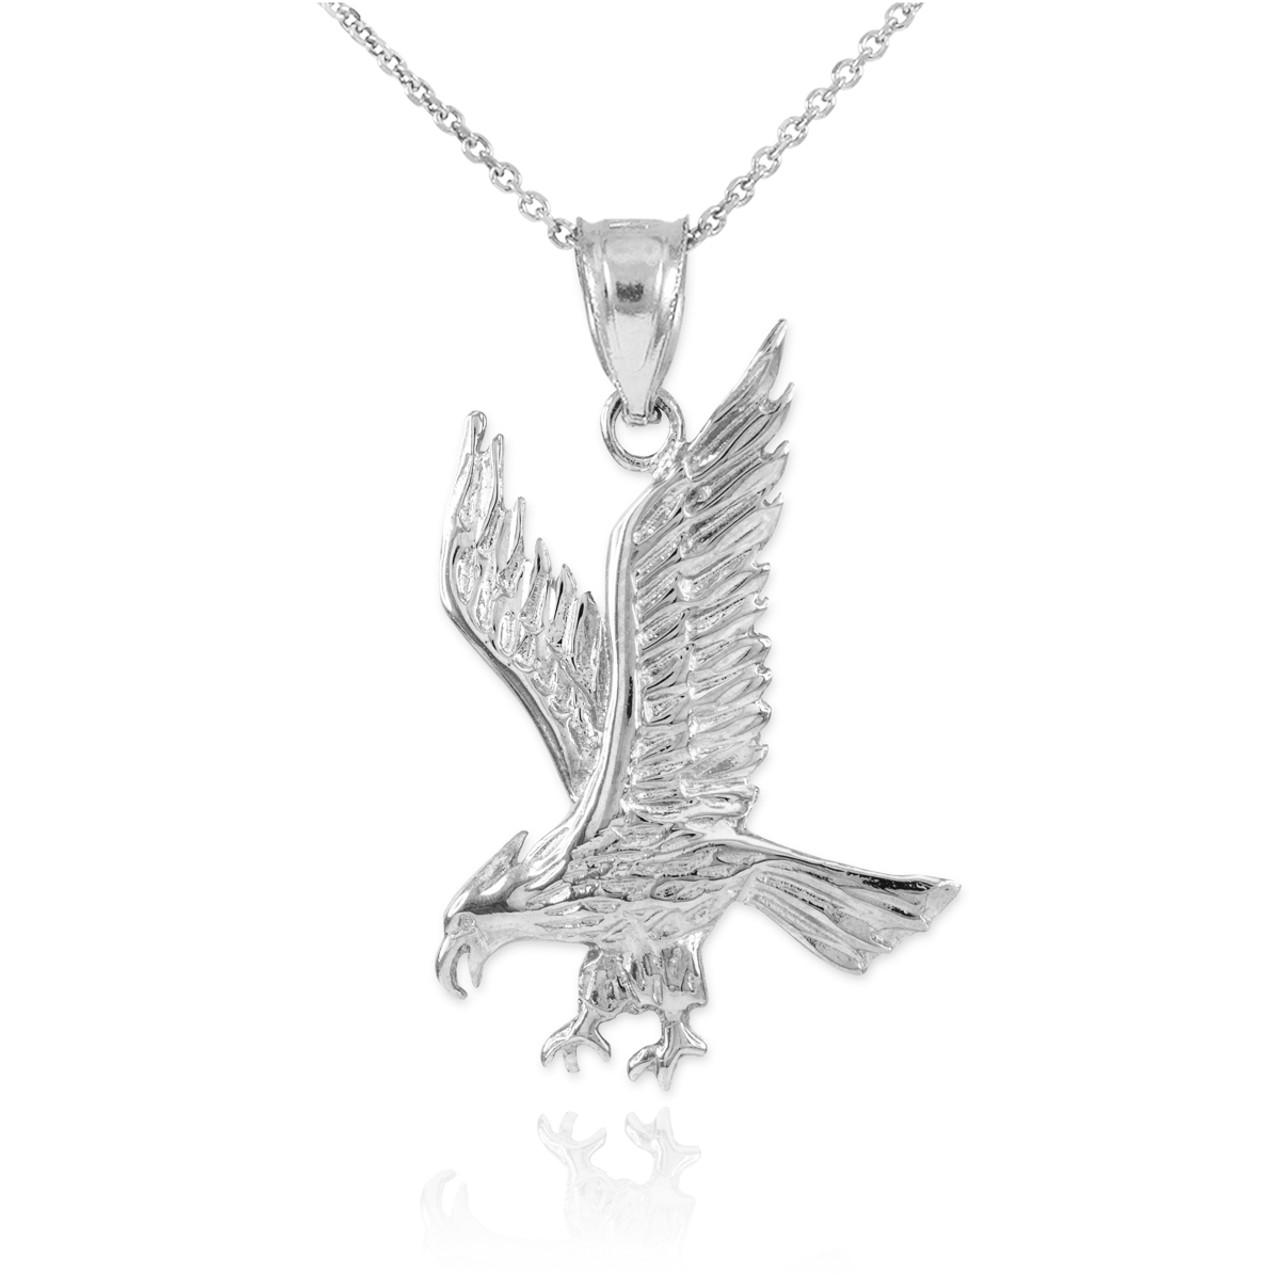 Solid white gold eagle pendant necklace eagle pendants solid white gold eagle pendant necklace aloadofball Images